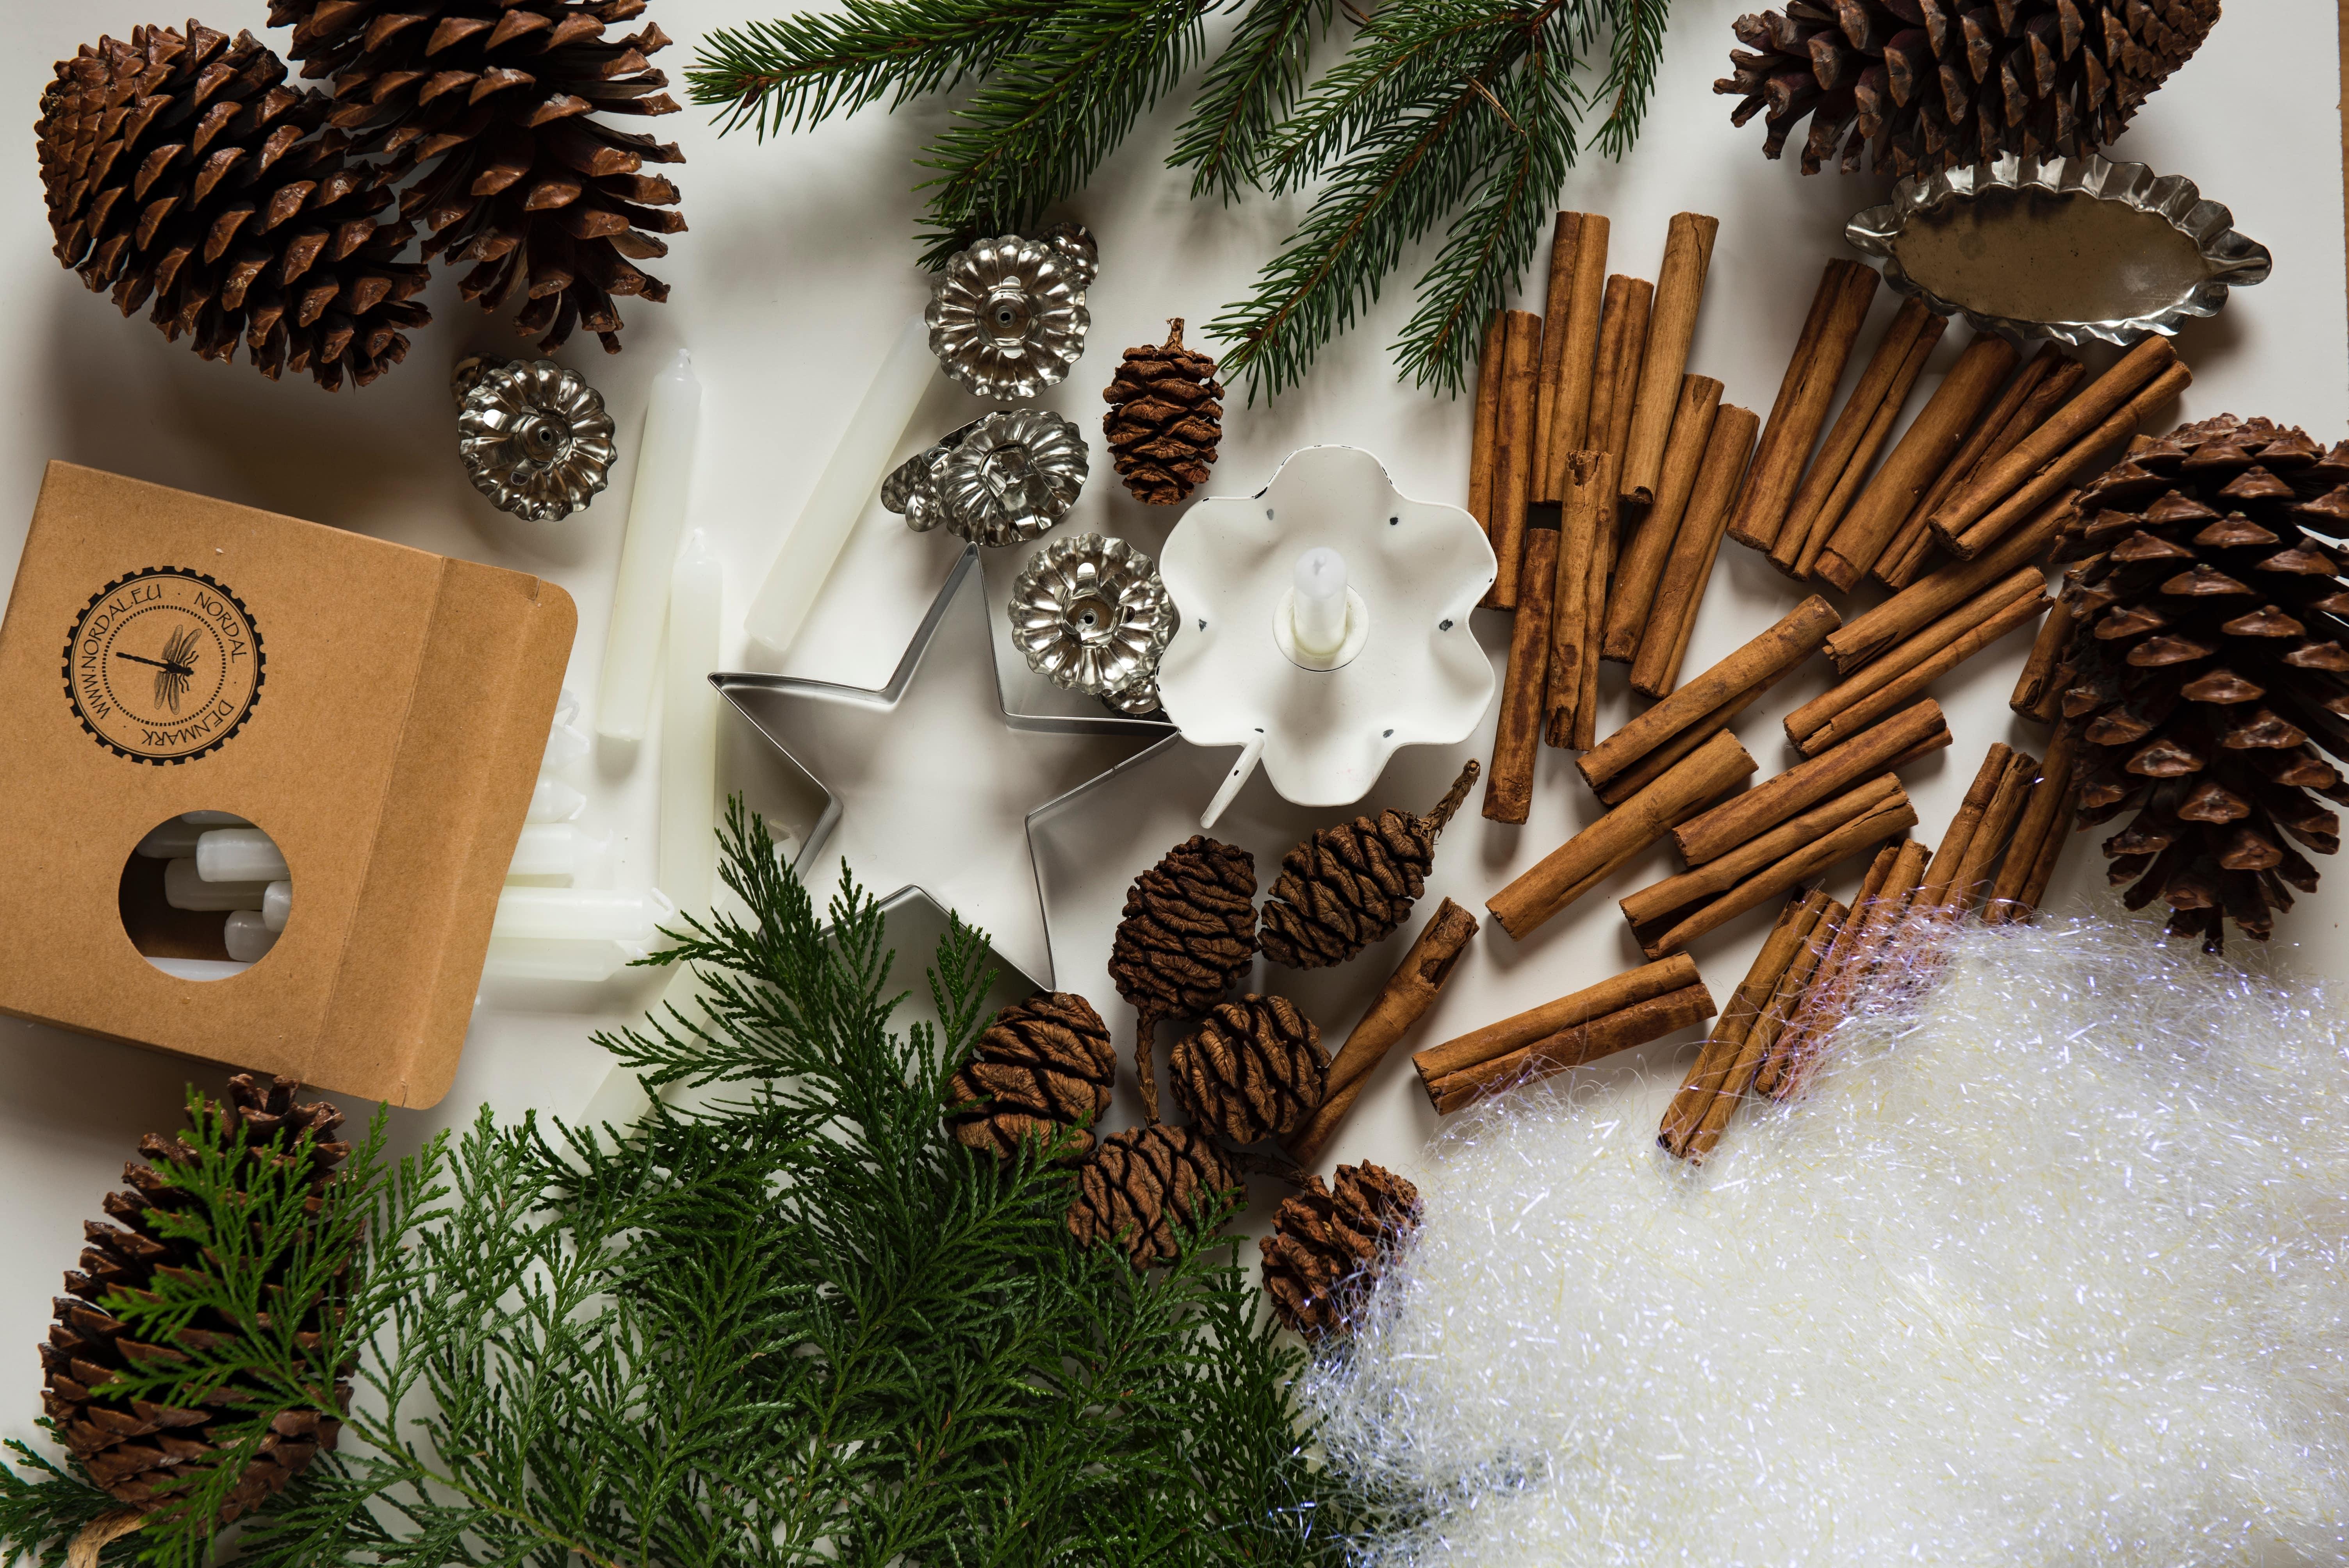 homemade edible christmas food gifts tasty treats to make and give image courtesy unsplash user joanna kosinska